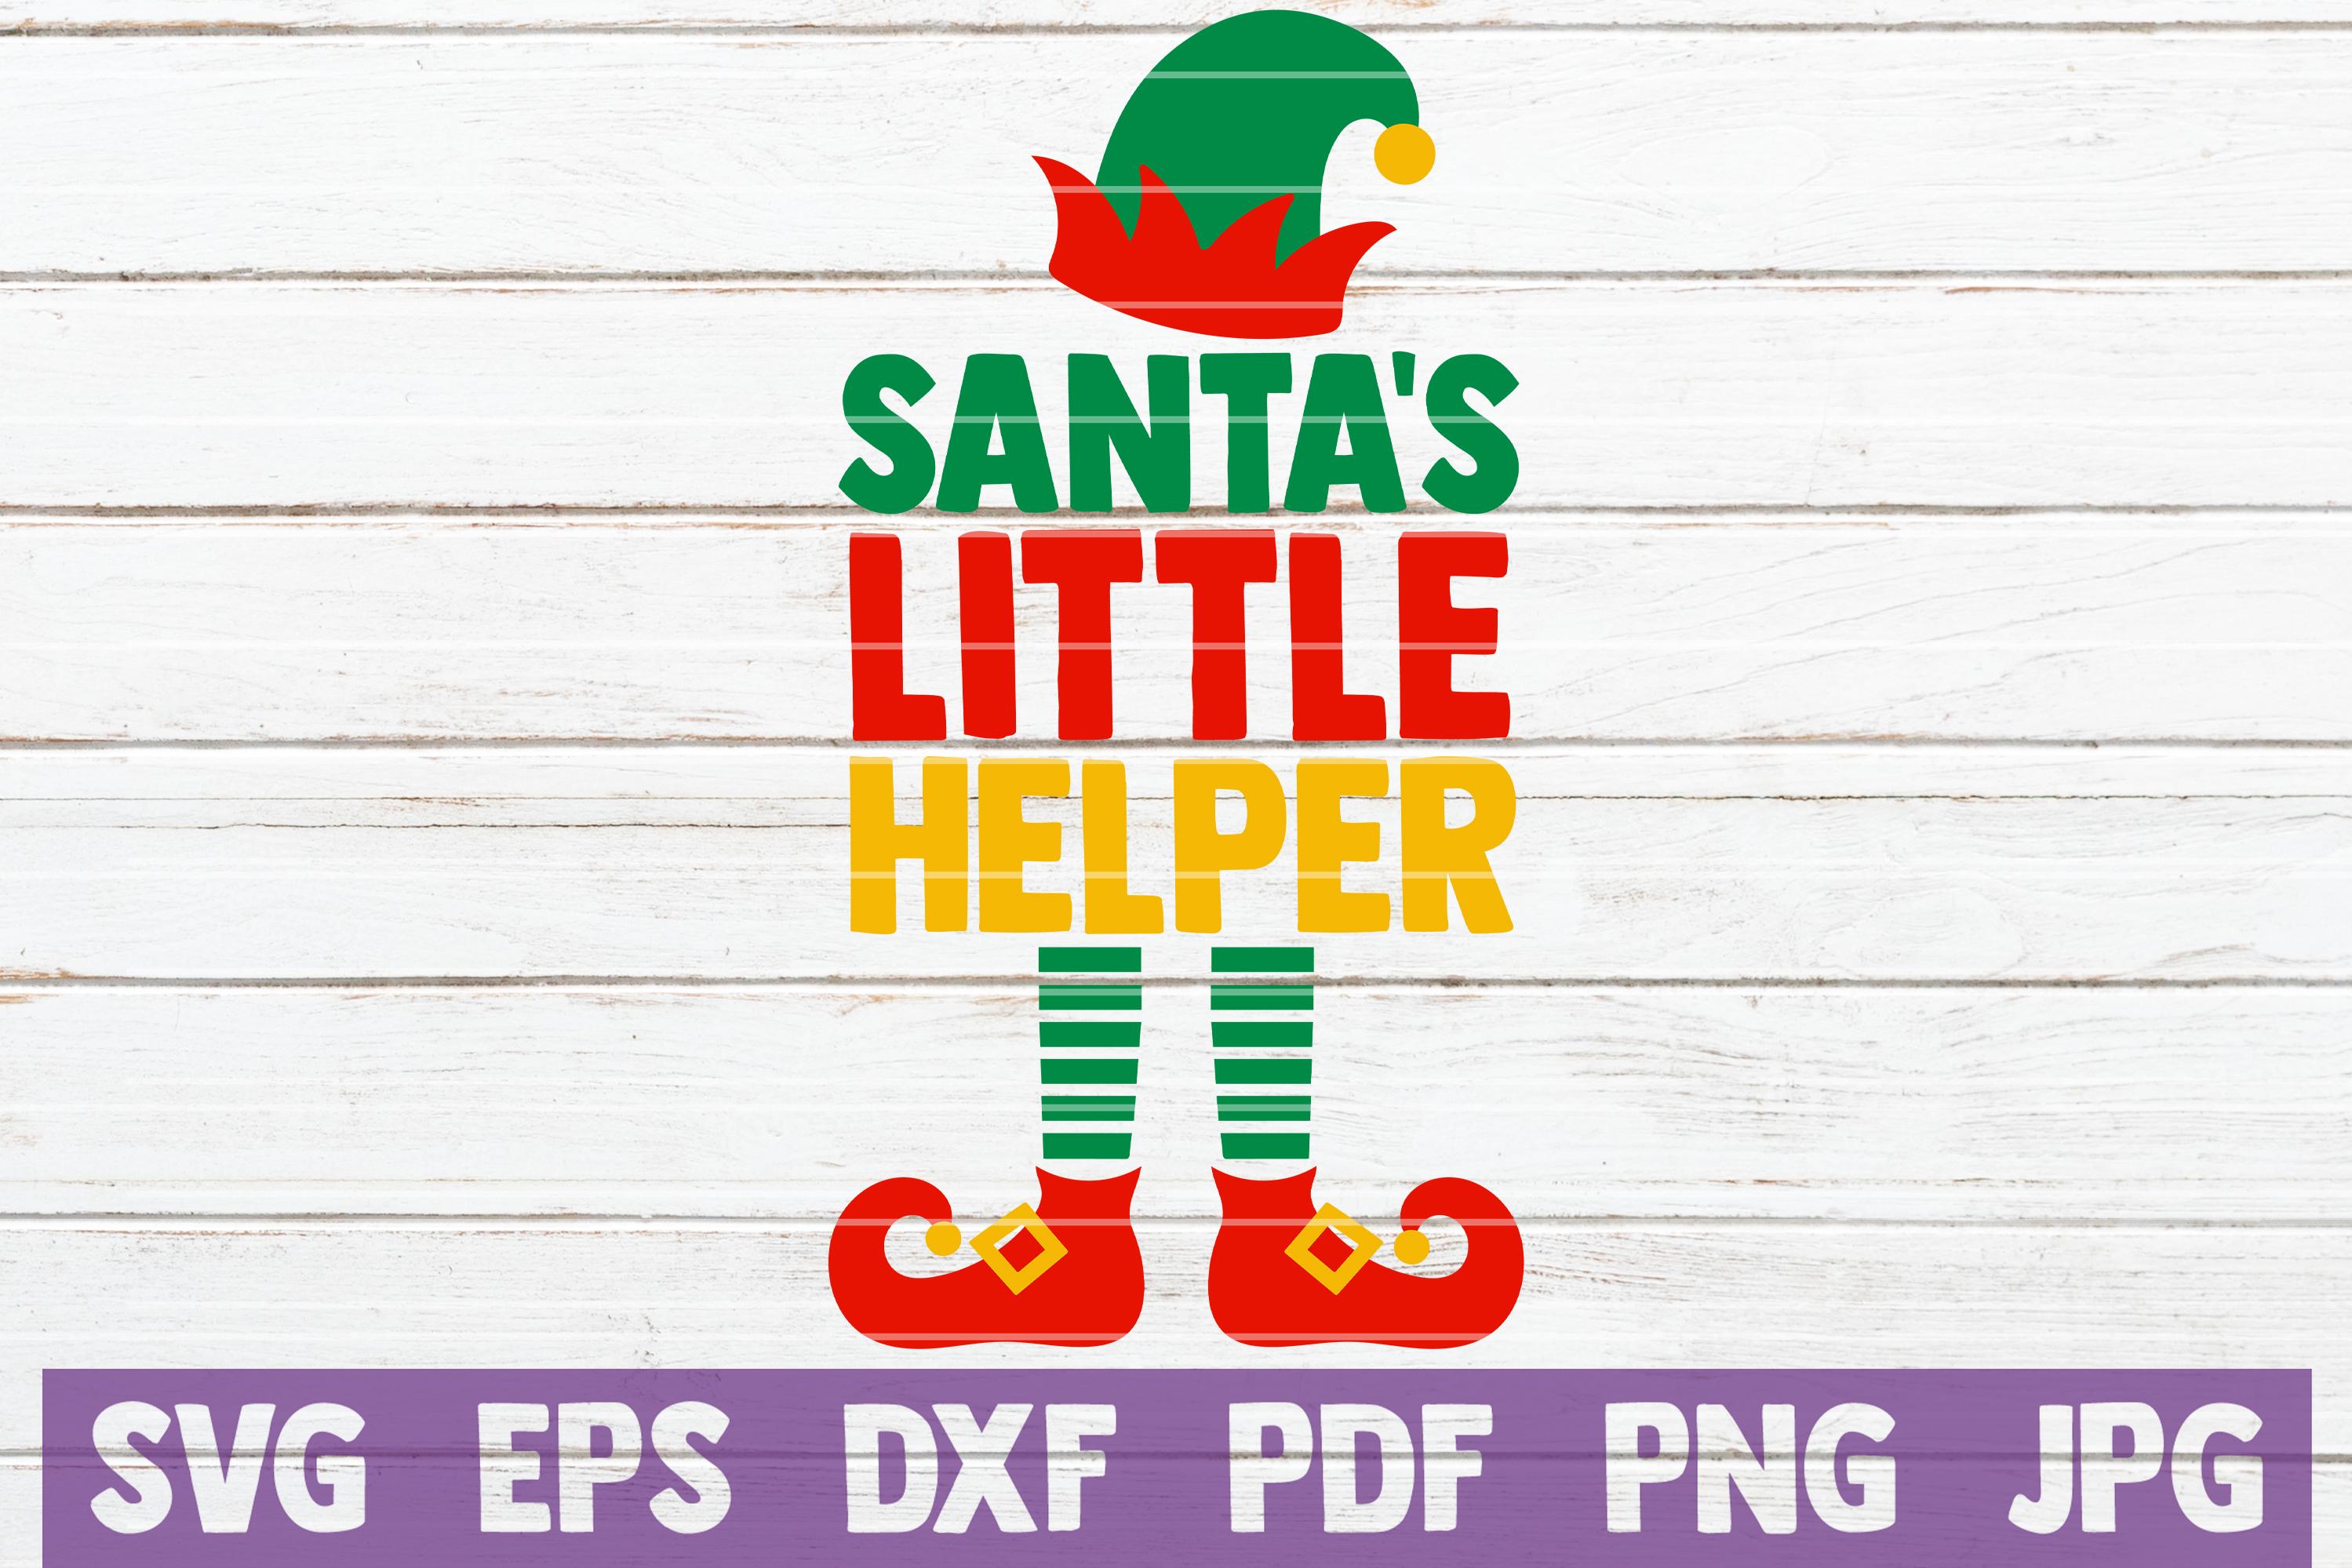 Santa's Little Helper SVG Cut File example image 1